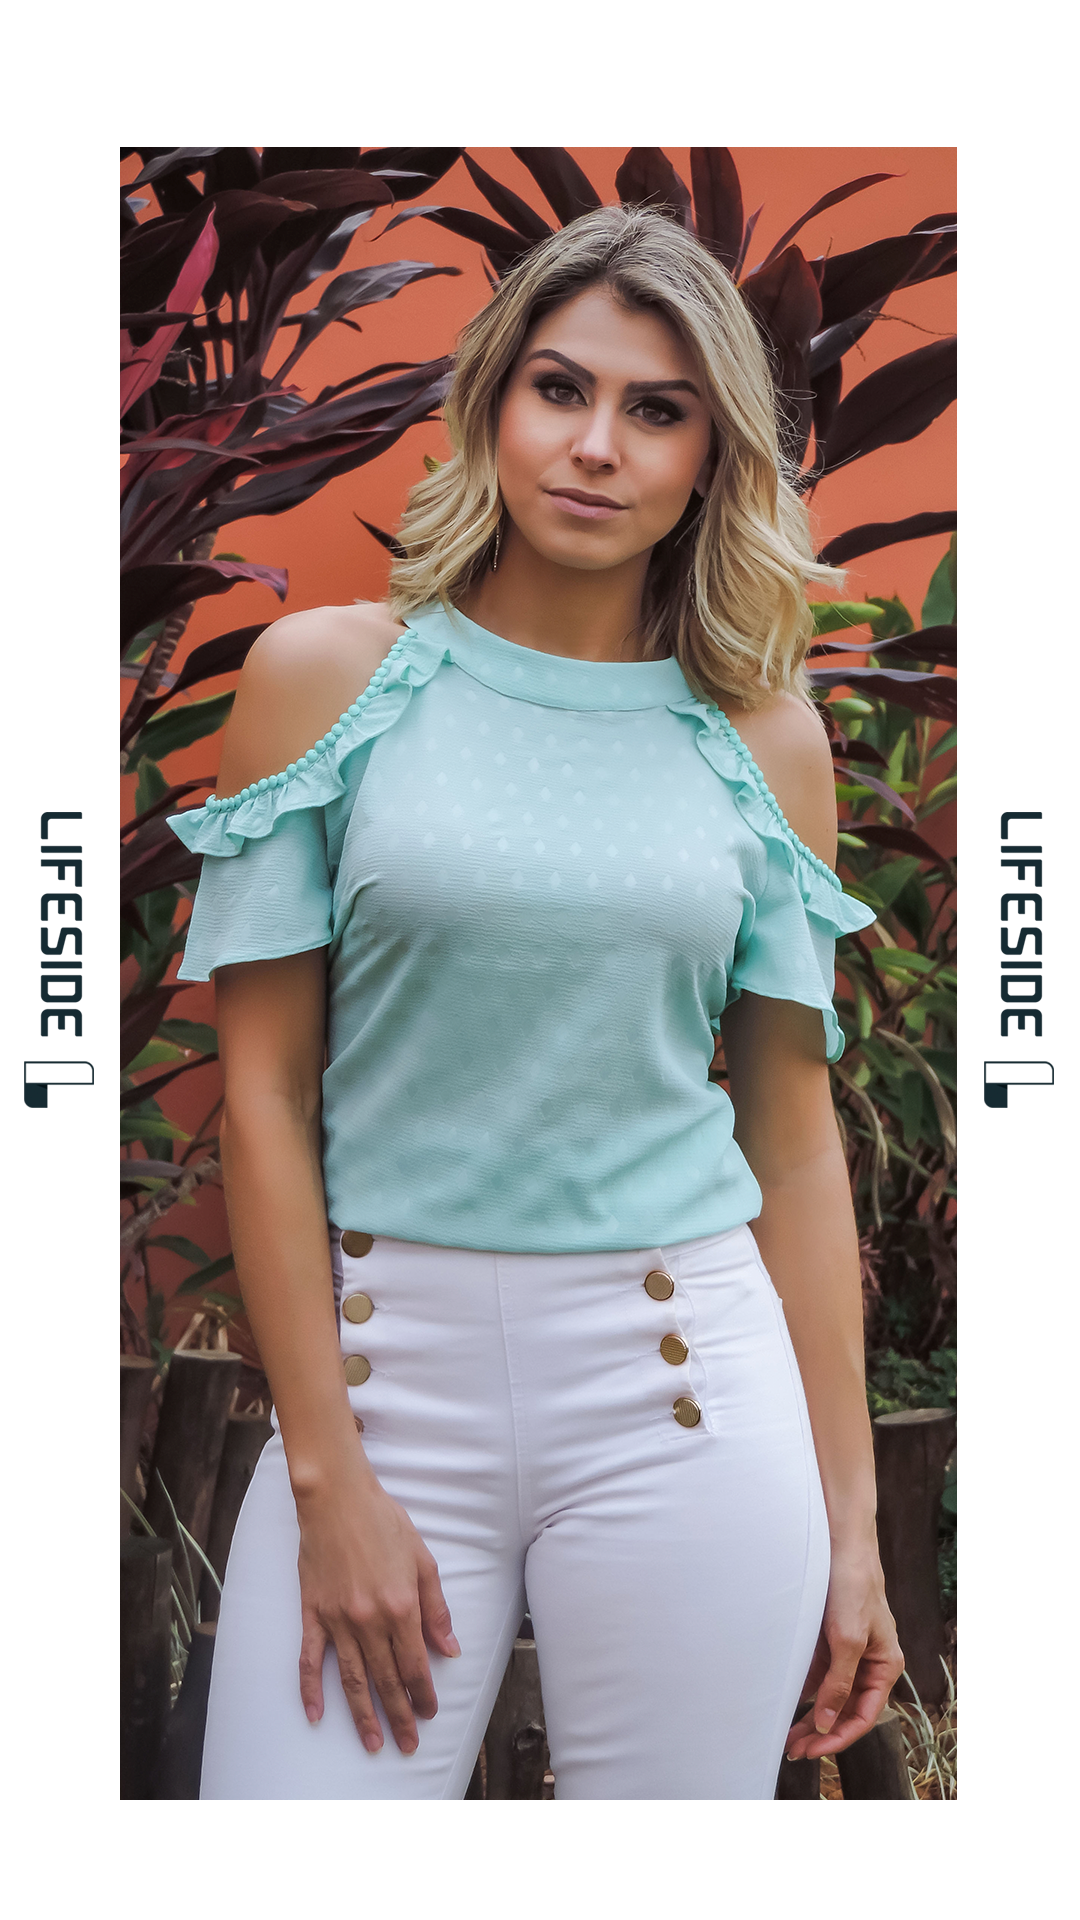 LIFESIDE | Moda Feminina Preview Primavera 2018. #Fashion